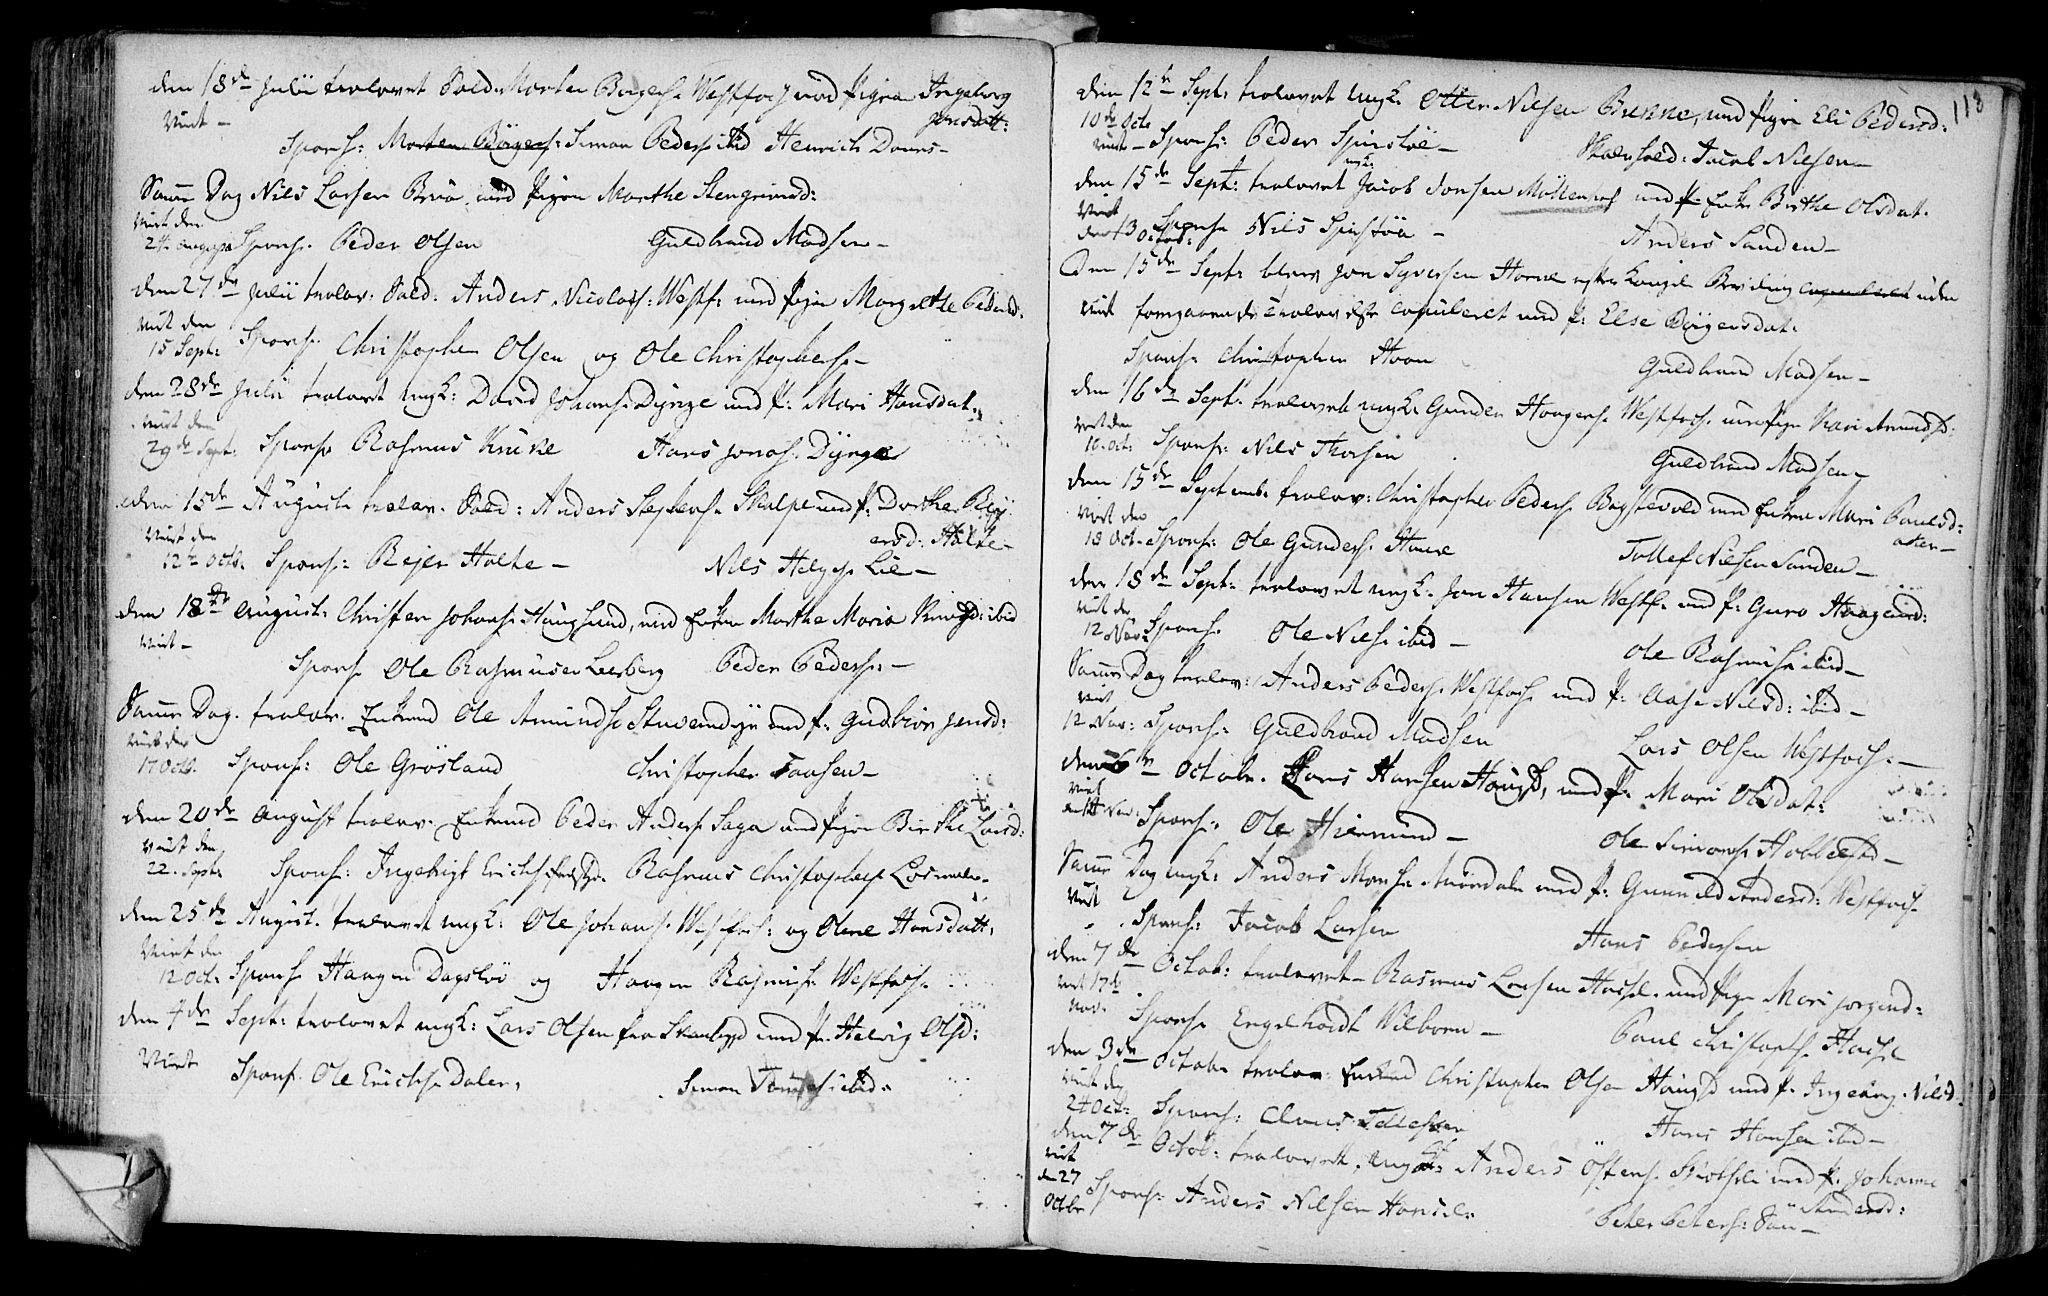 SAKO, Eiker kirkebøker, F/Fa/L0007: Ministerialbok nr. I 7 /1, 1733-1808, s. 113